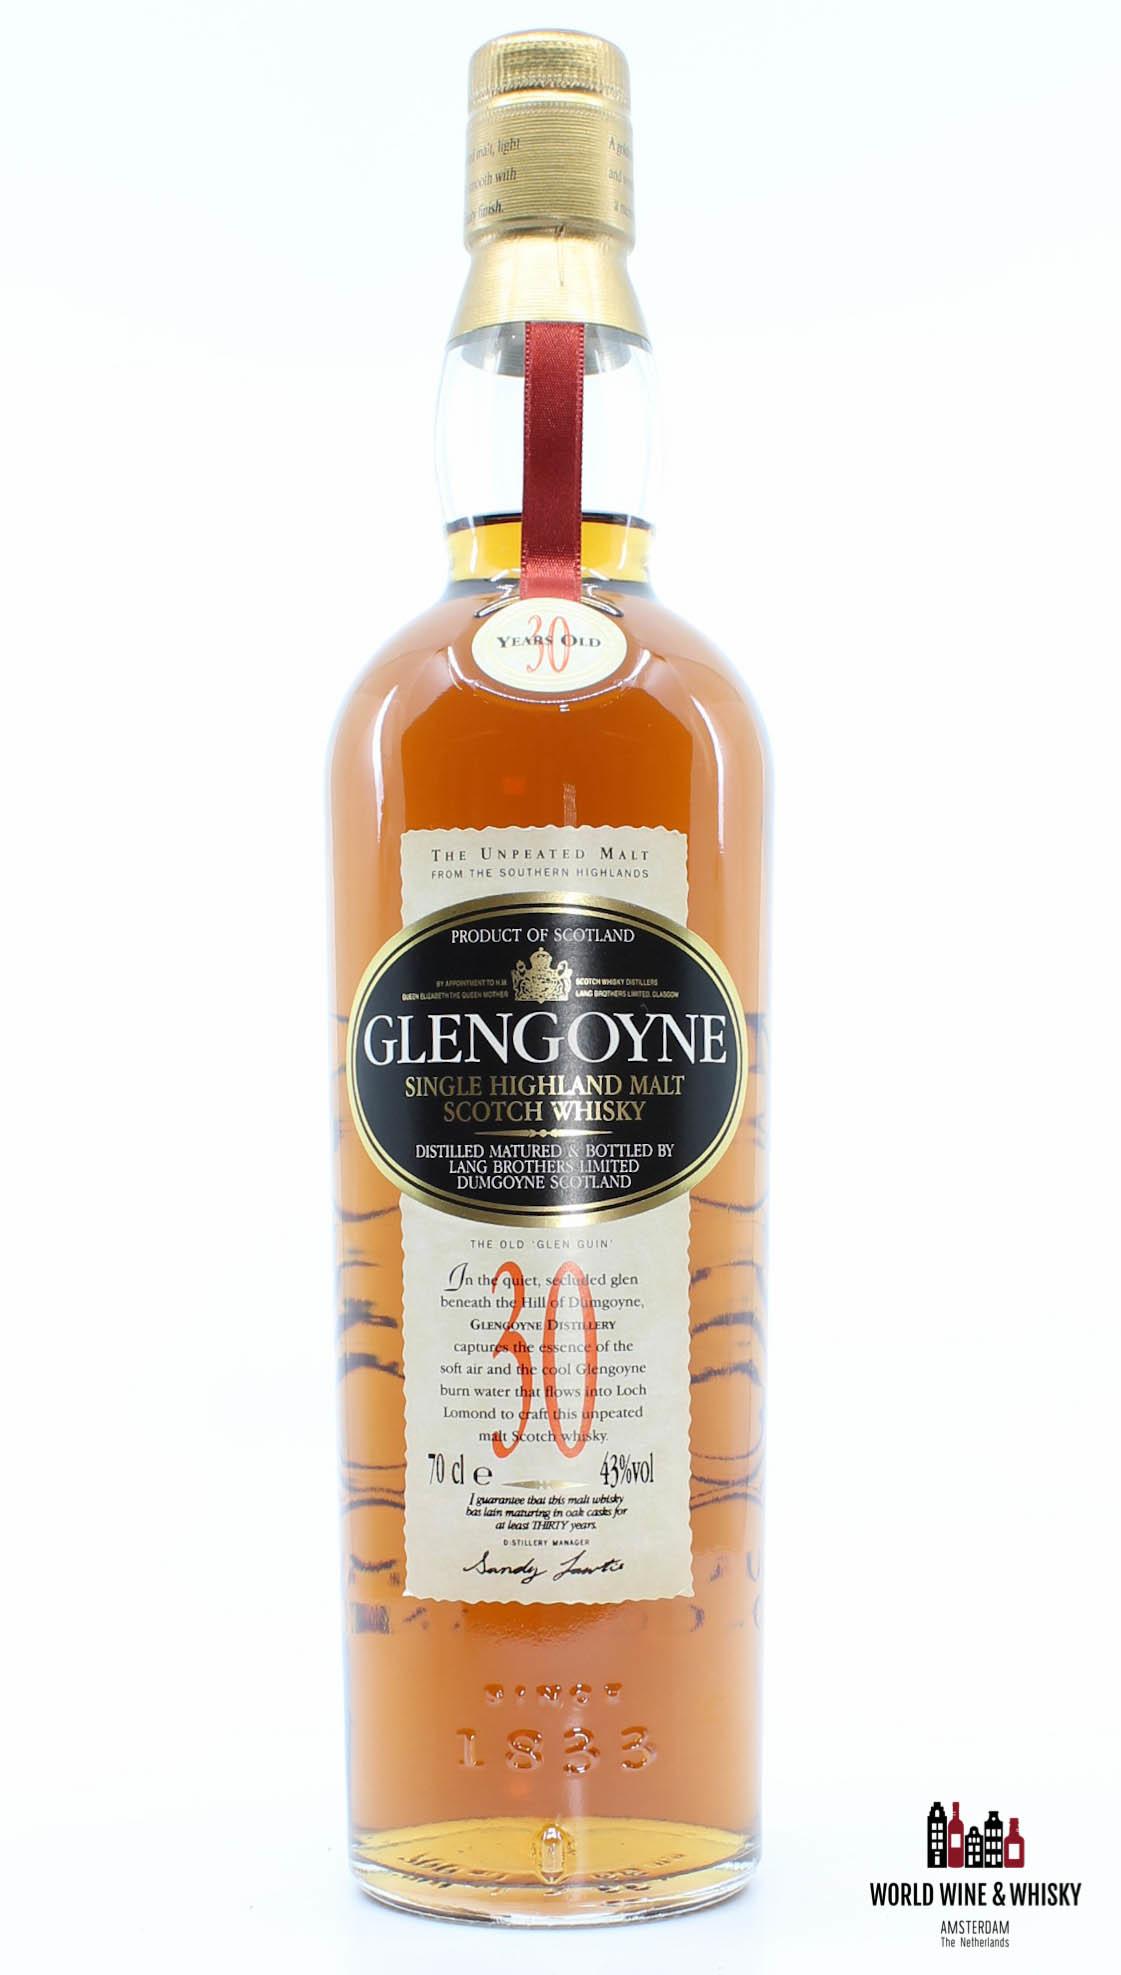 Glengoyne Glengoyne 30 Years Old 43% (in a big luxury wooden case)